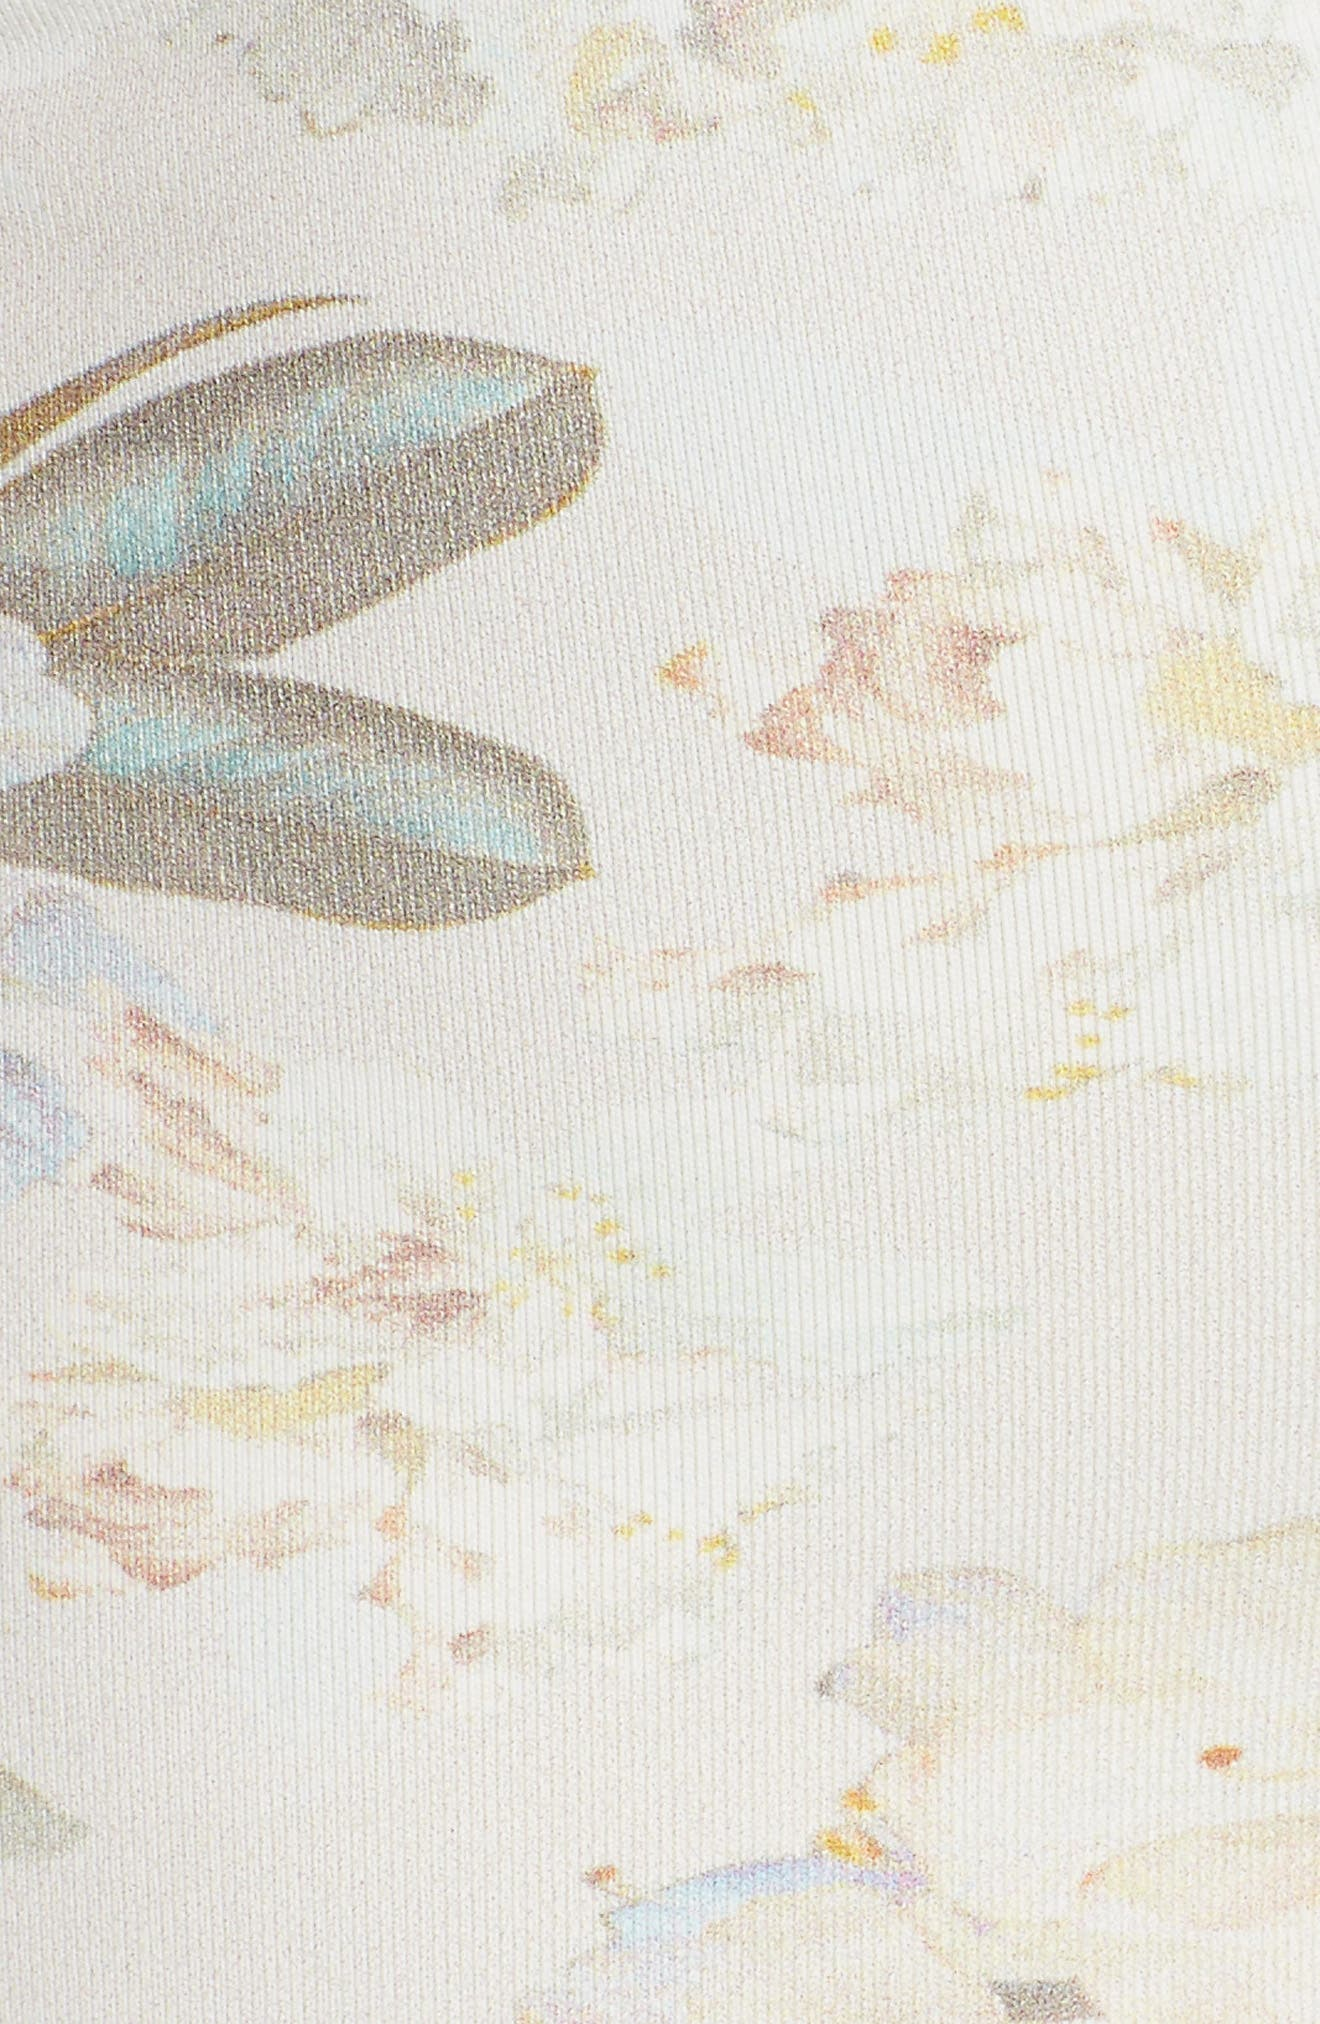 Sandrita Bikini Top,                             Alternate thumbnail 5, color,                             Ete Floral White